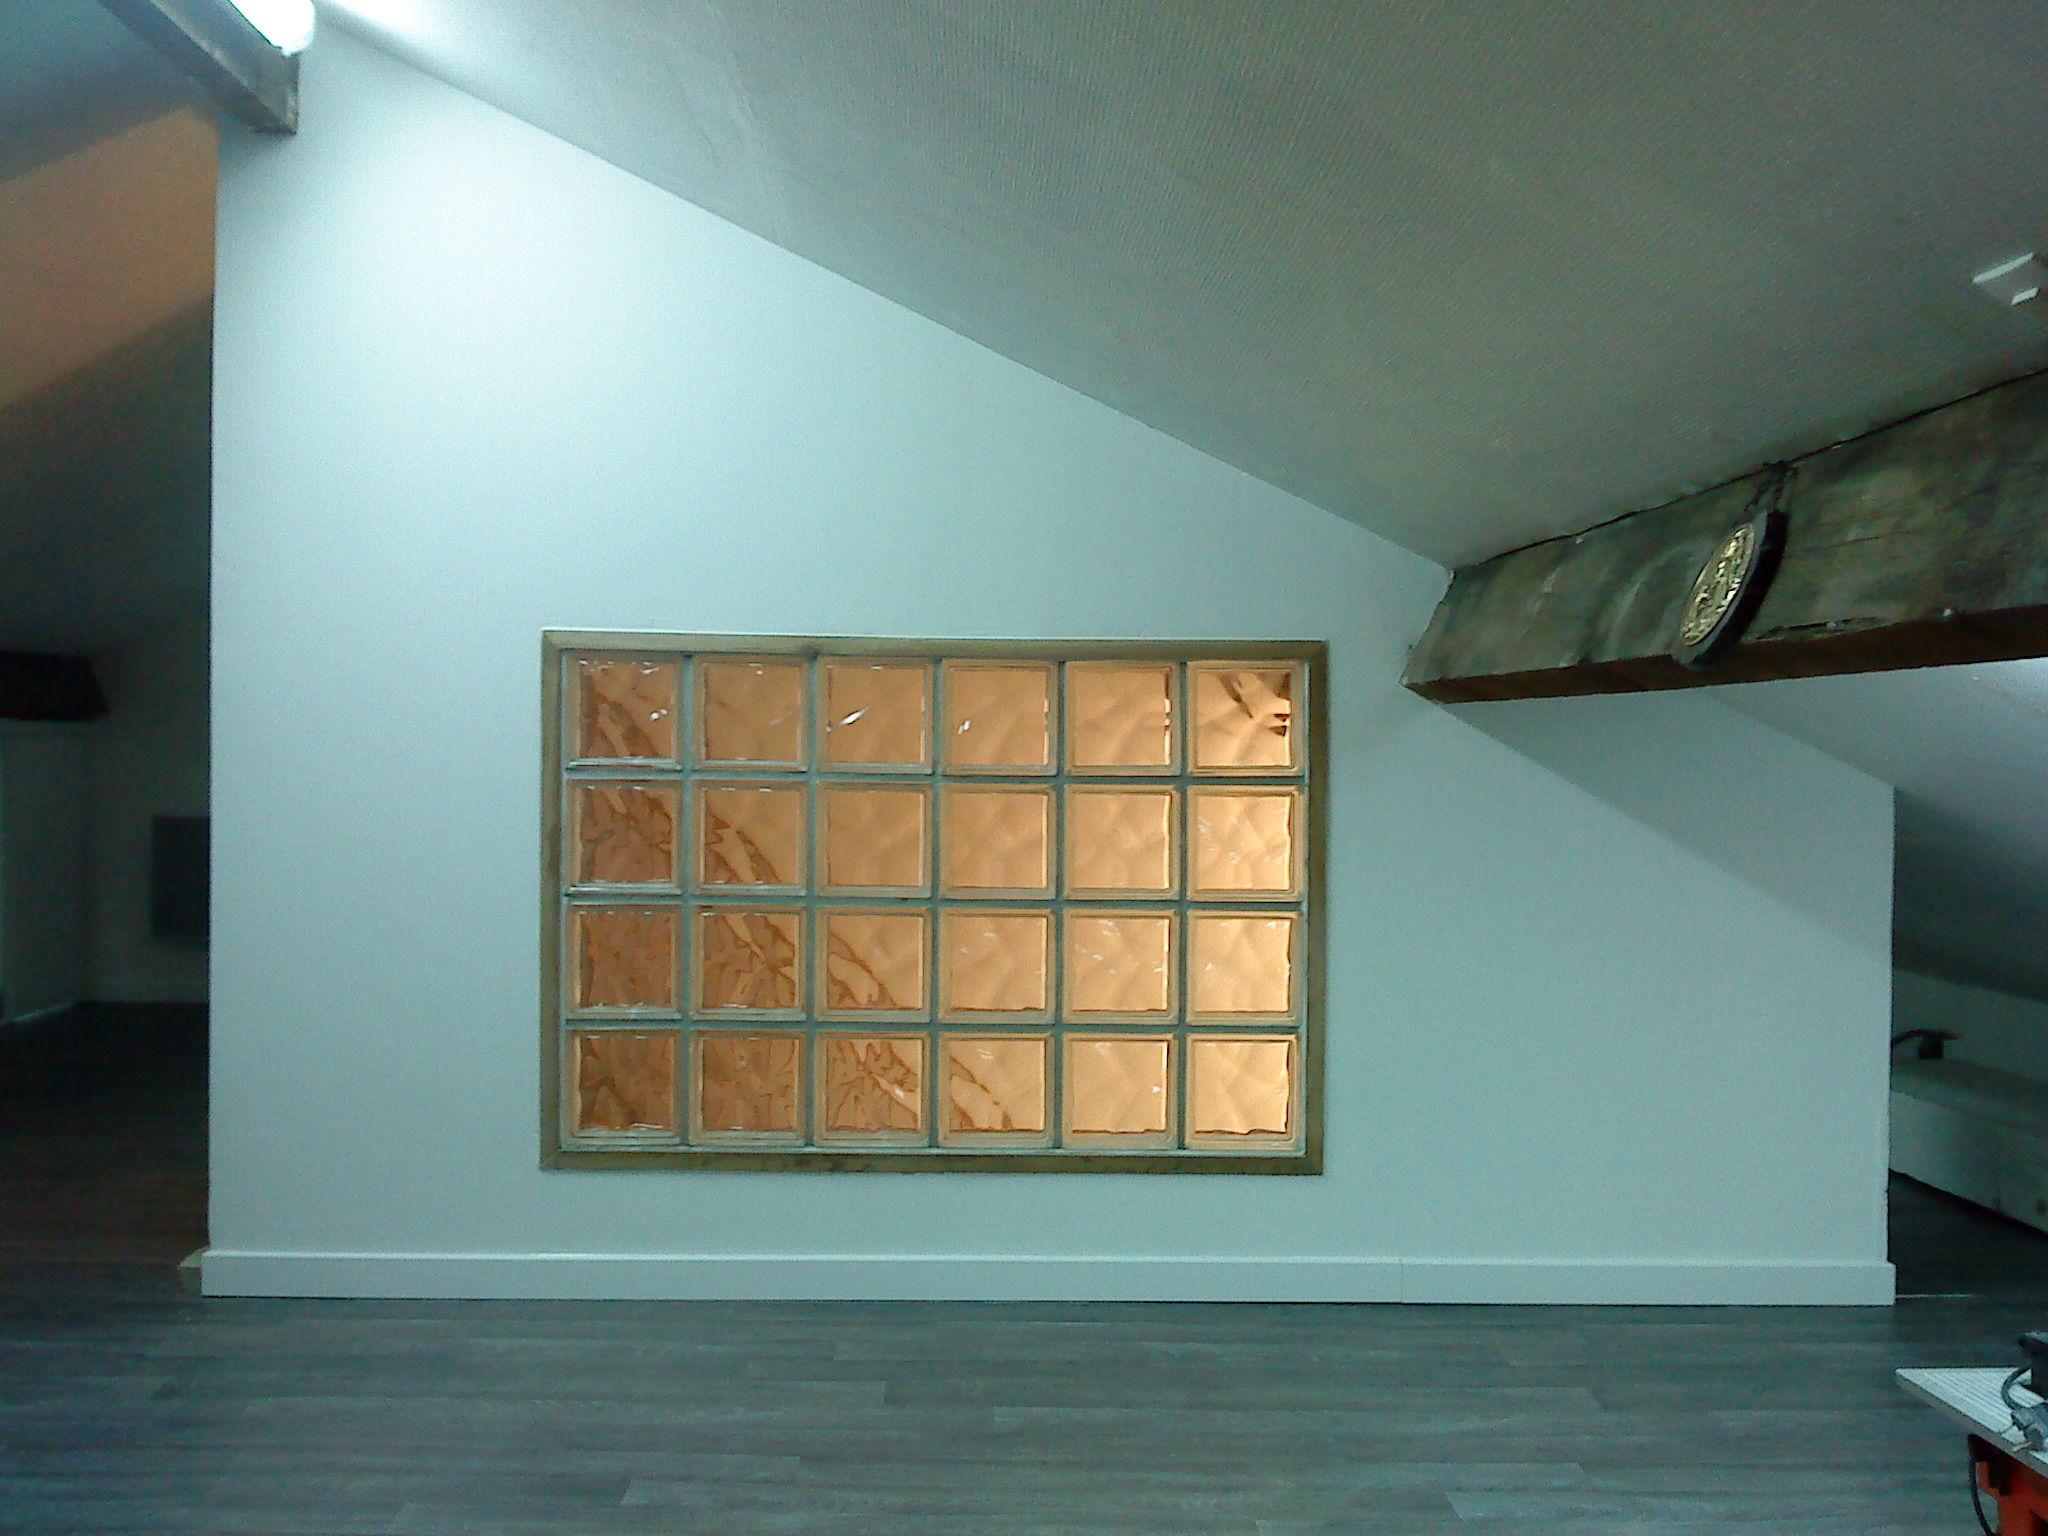 Awesome Amenagement Cage D Escalier Contemporary - Design Trends ...